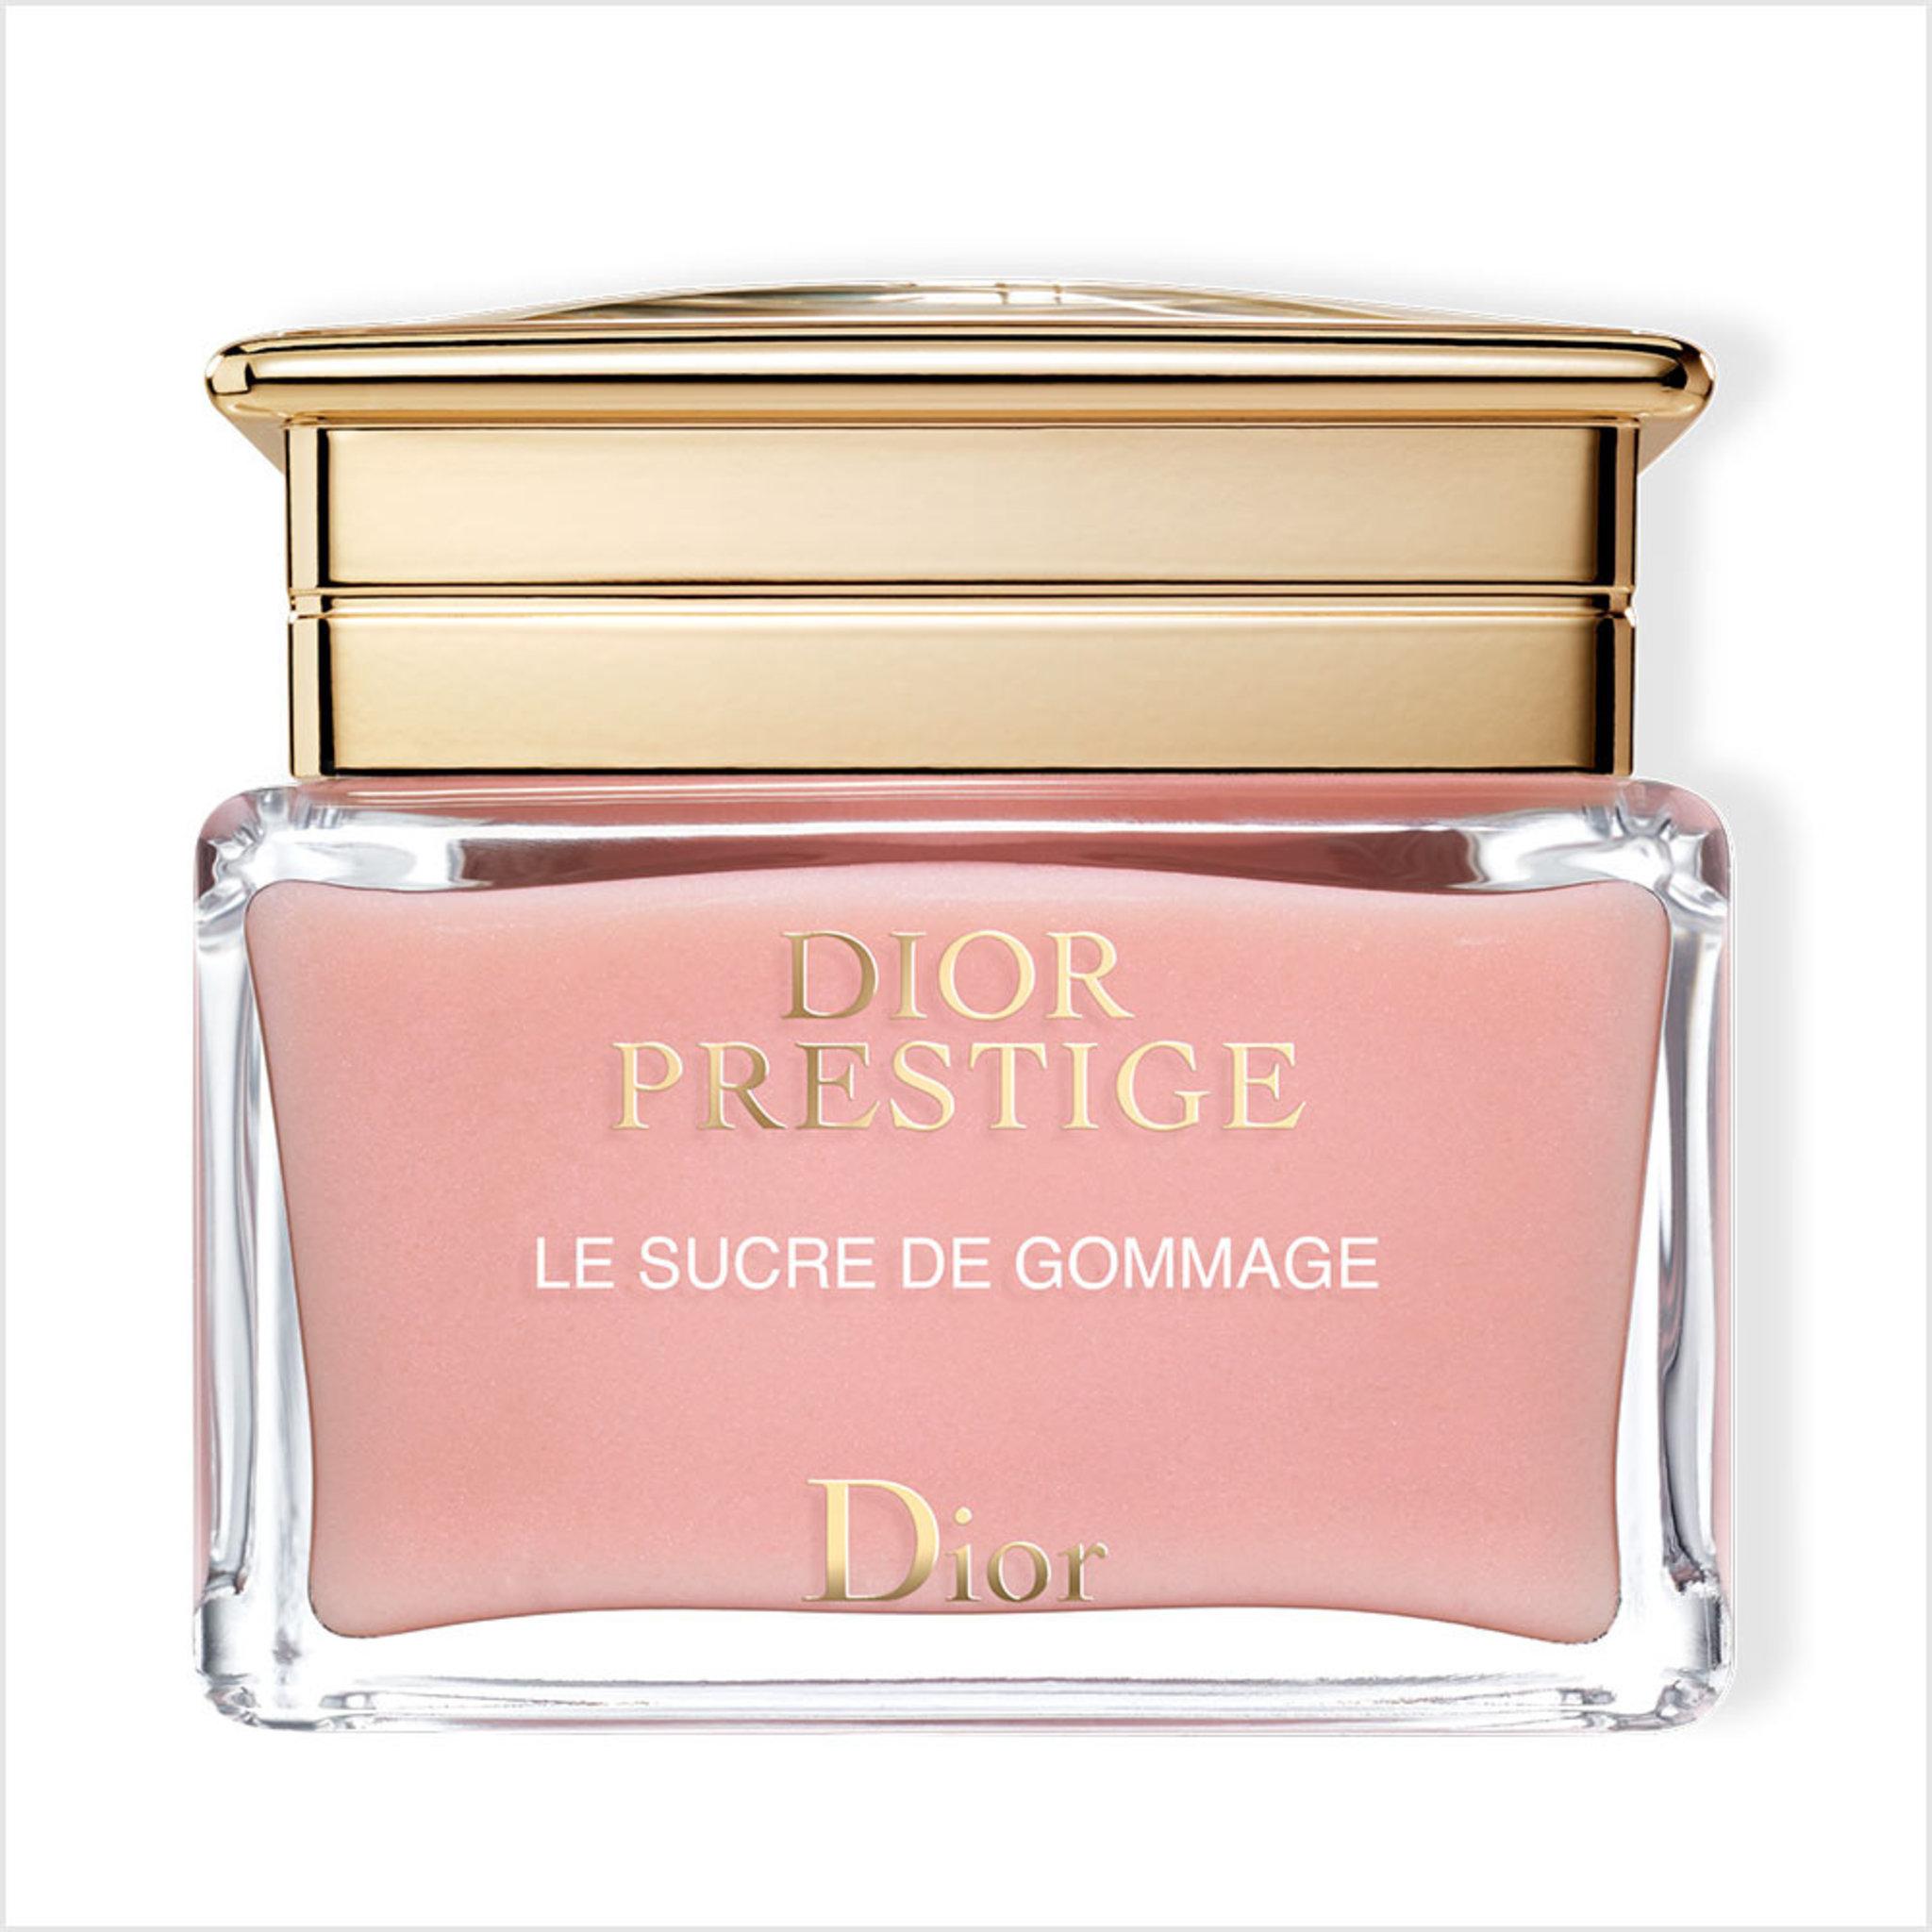 Dior Prestige Clean Scrub, 150 ML